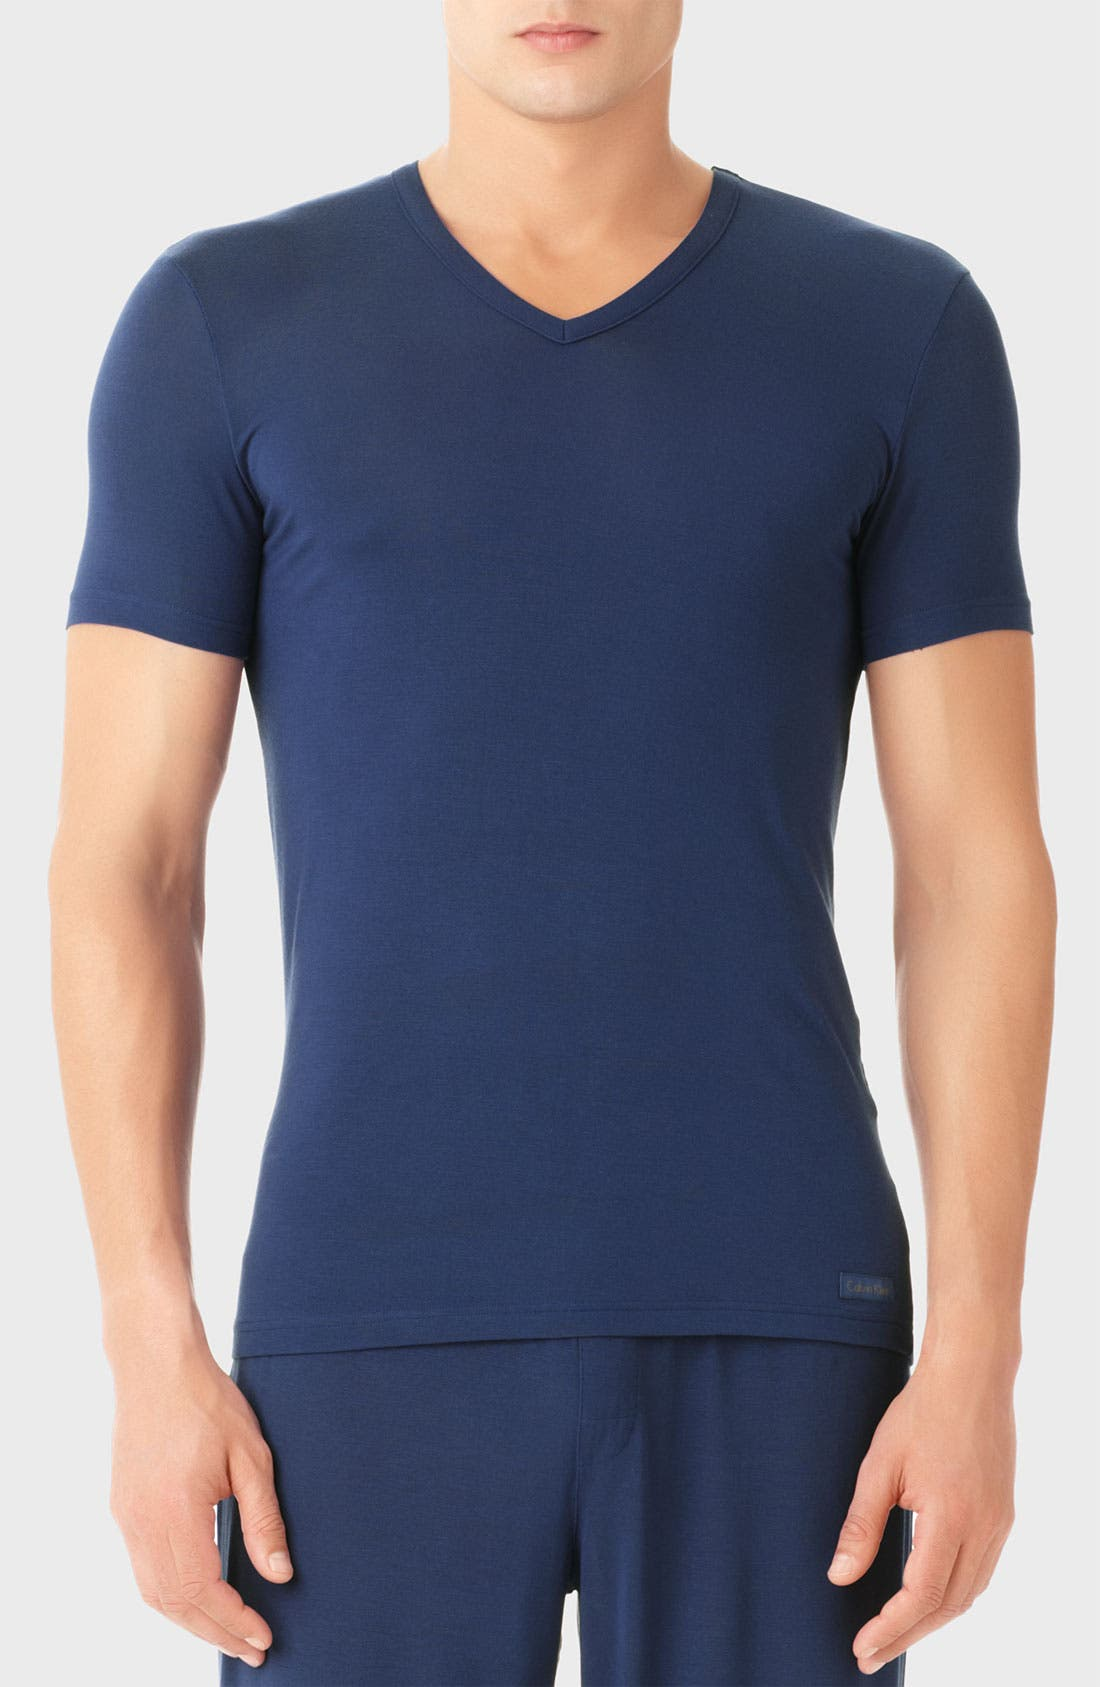 Main Image - Calvin Klein 'U5563' V-Neck Micromodal T-Shirt